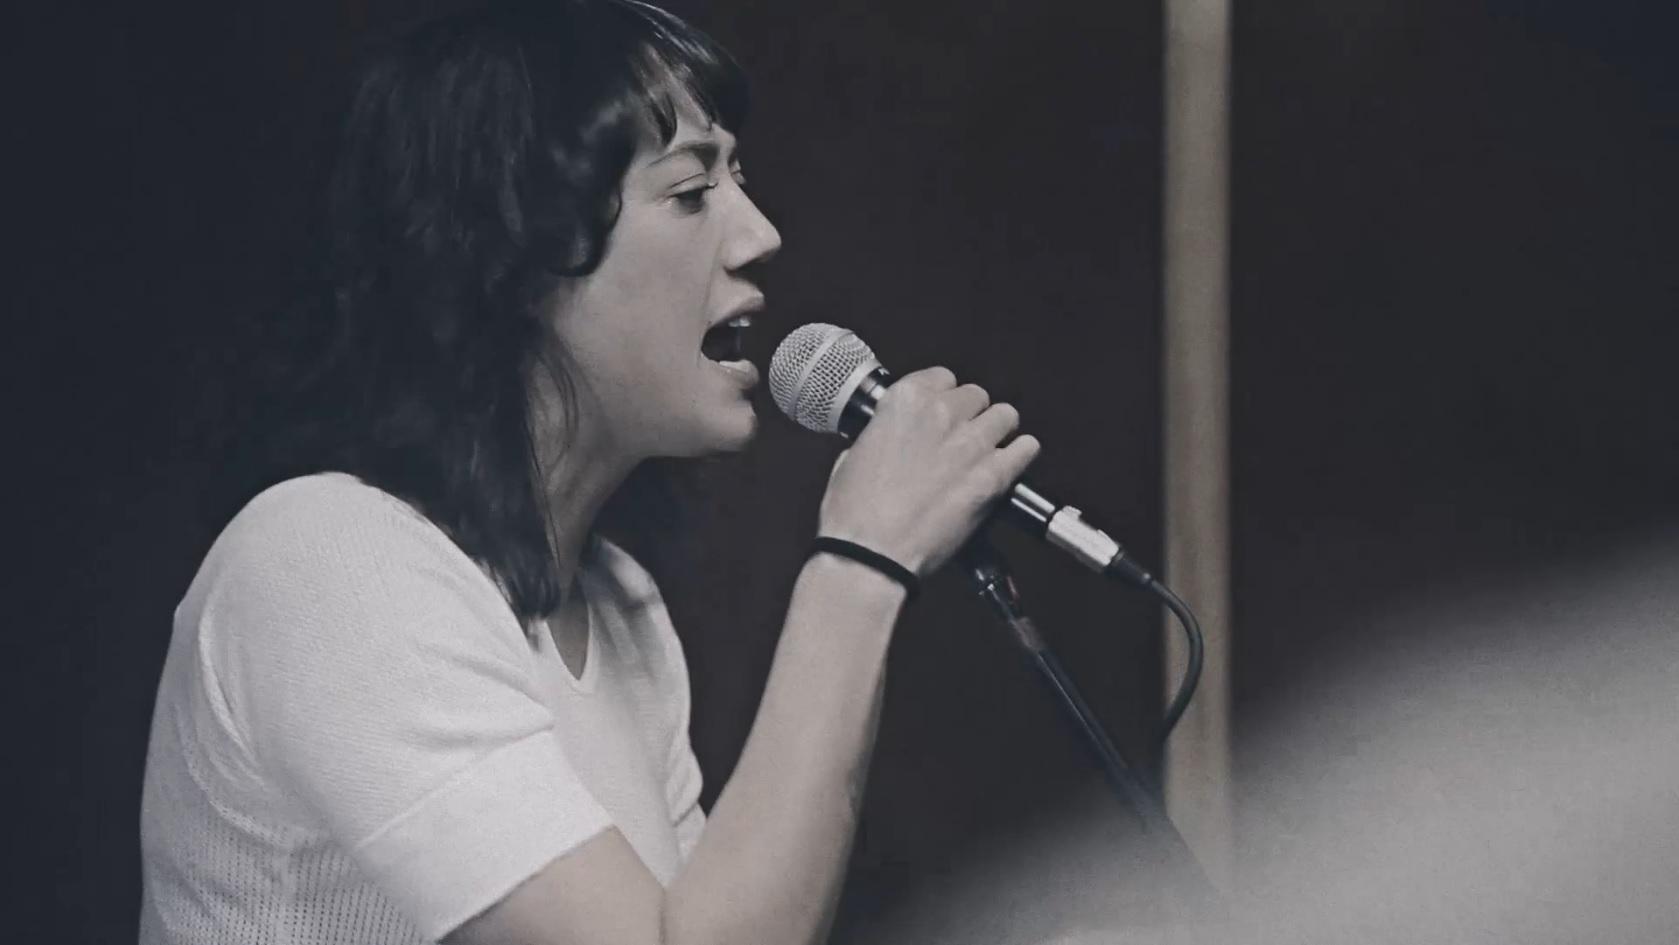 Inge Beckmann singing Mudhoney's 'Touch Me I'm Sick' in their 'Smoke Swig Swear' short film